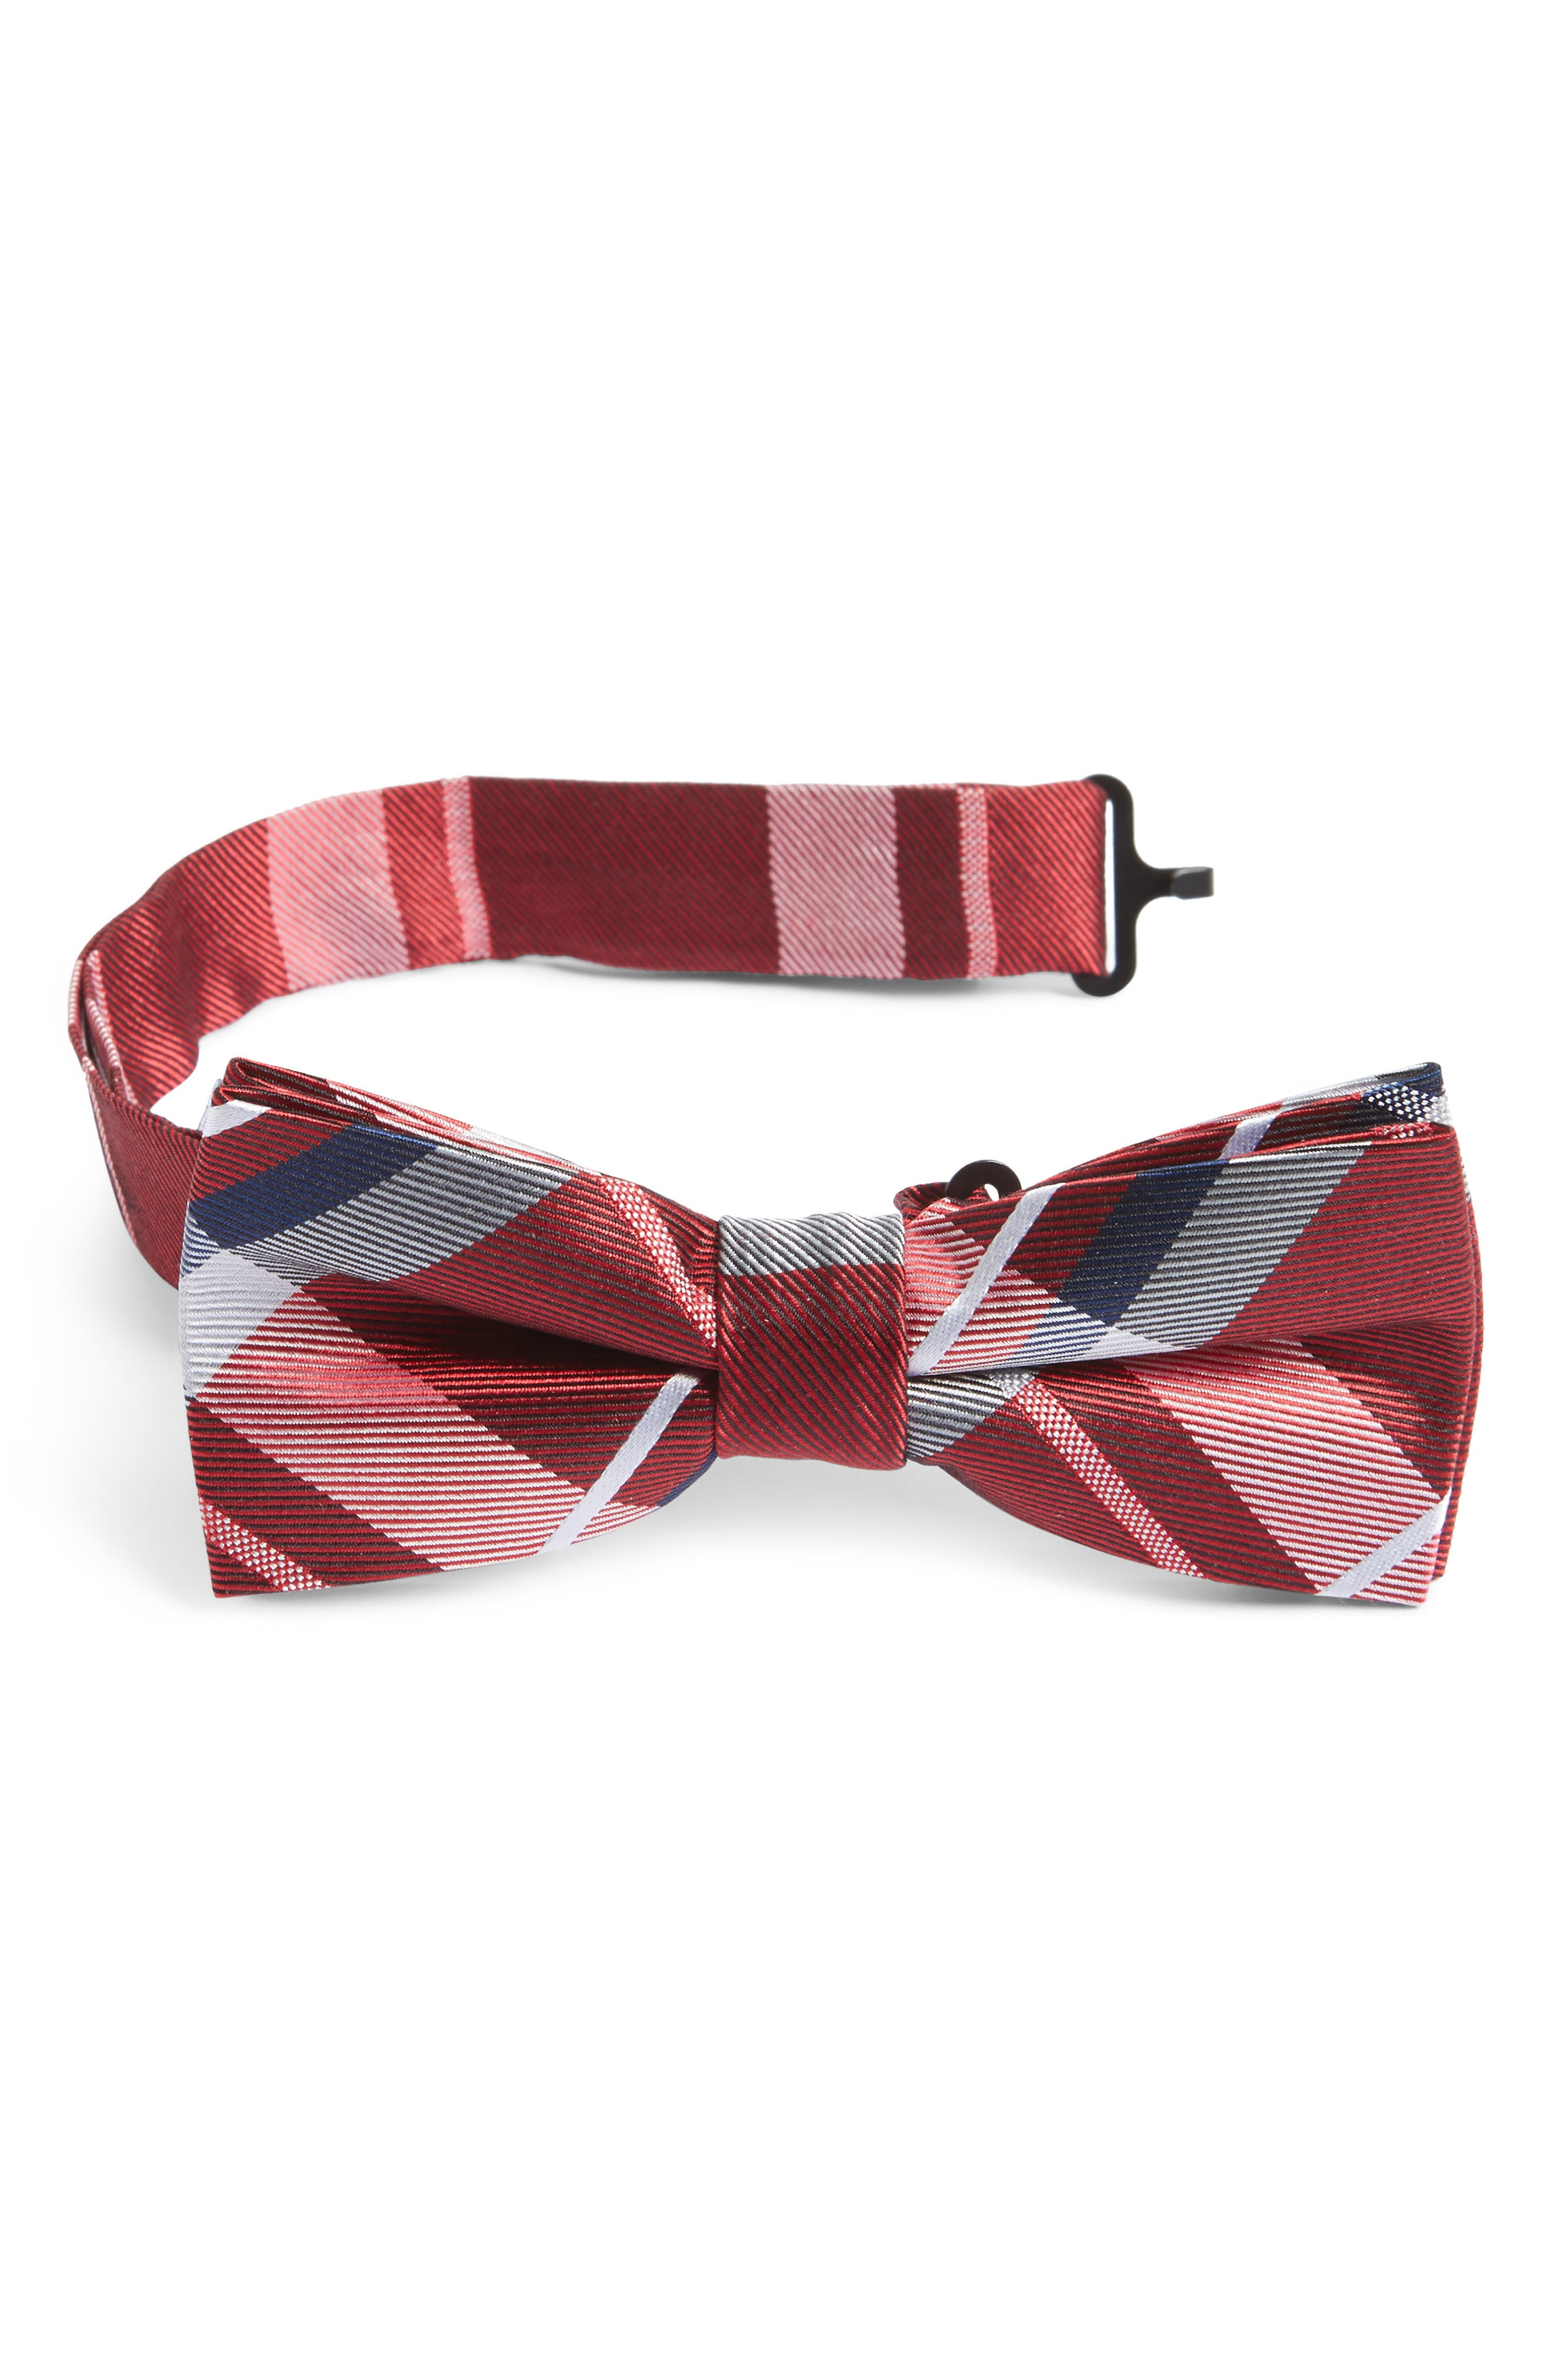 Alternate Image 1 Selected - Nordstrom Plaid Silk Bow Tie (Big Boys)